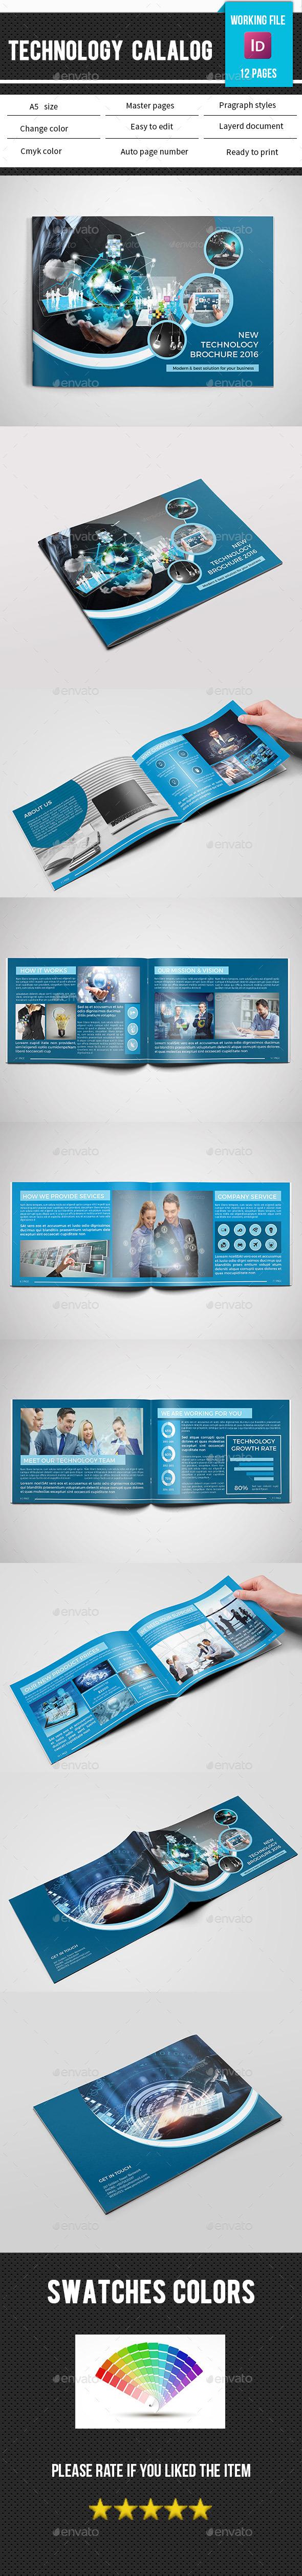 Technology Catalog/Brochure-V191 - Catalogs Brochures